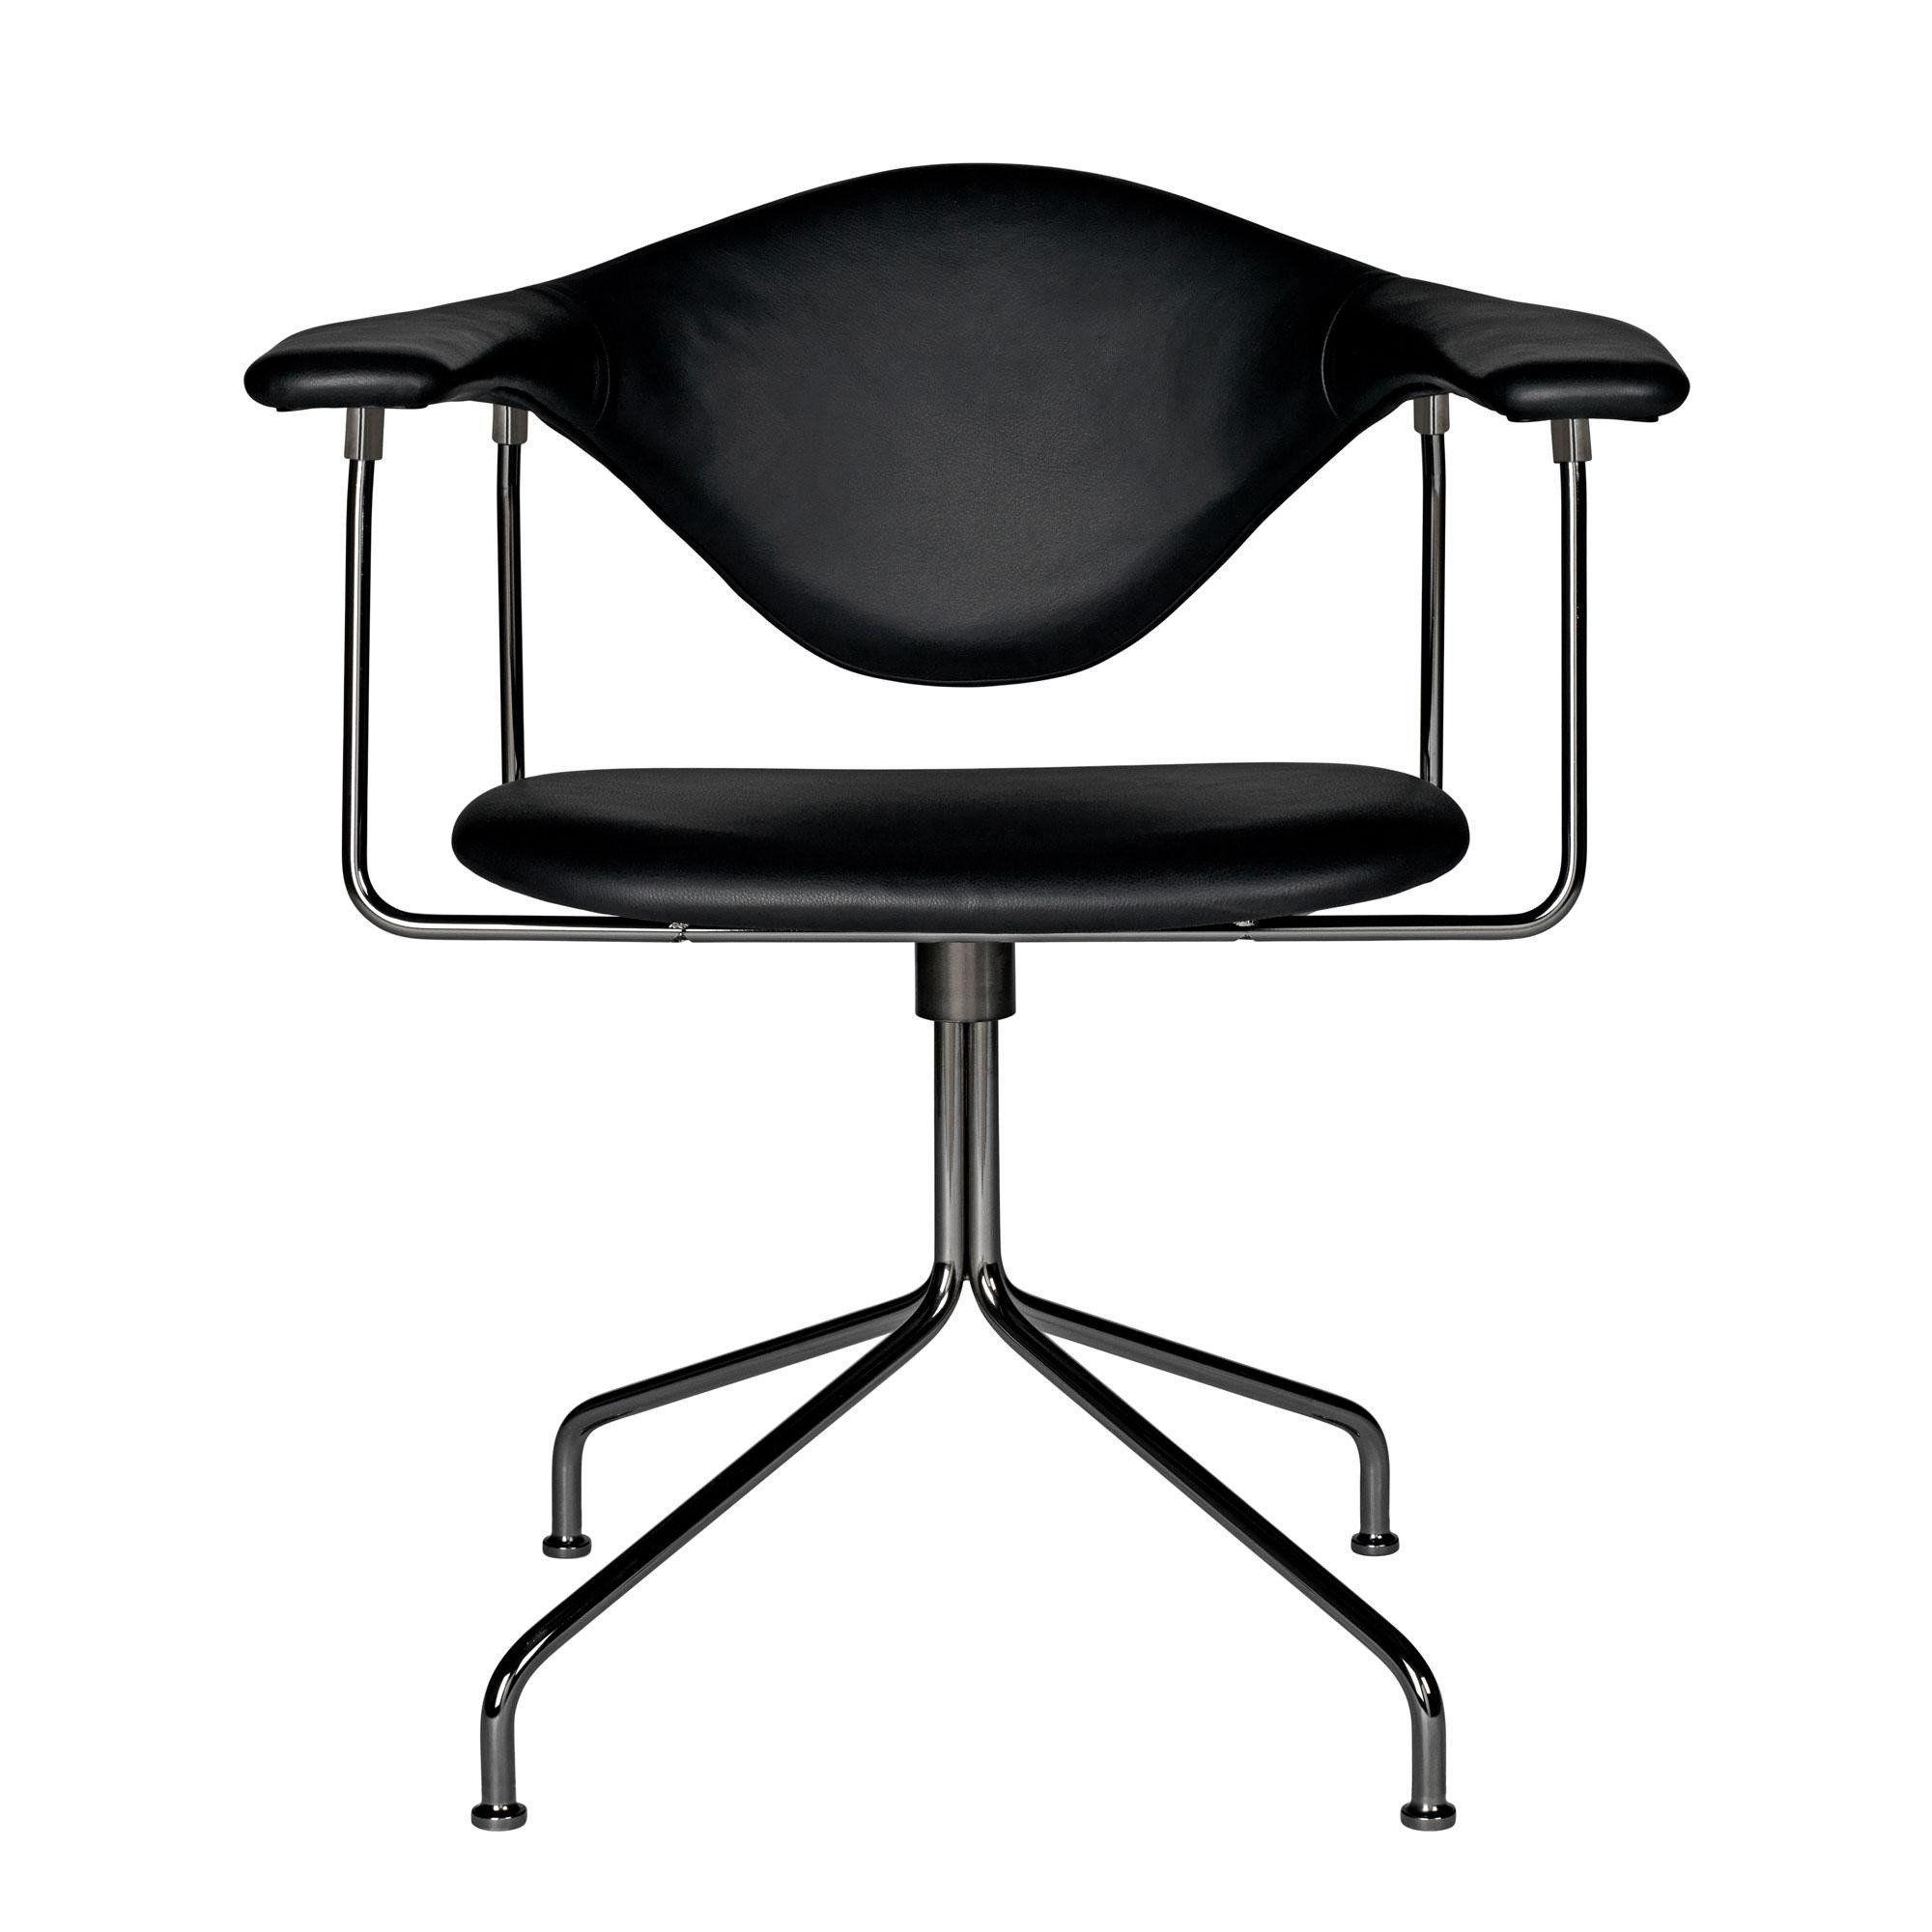 Gubi Masculo Dining Chair - Silla giratoria | AmbienteDirect